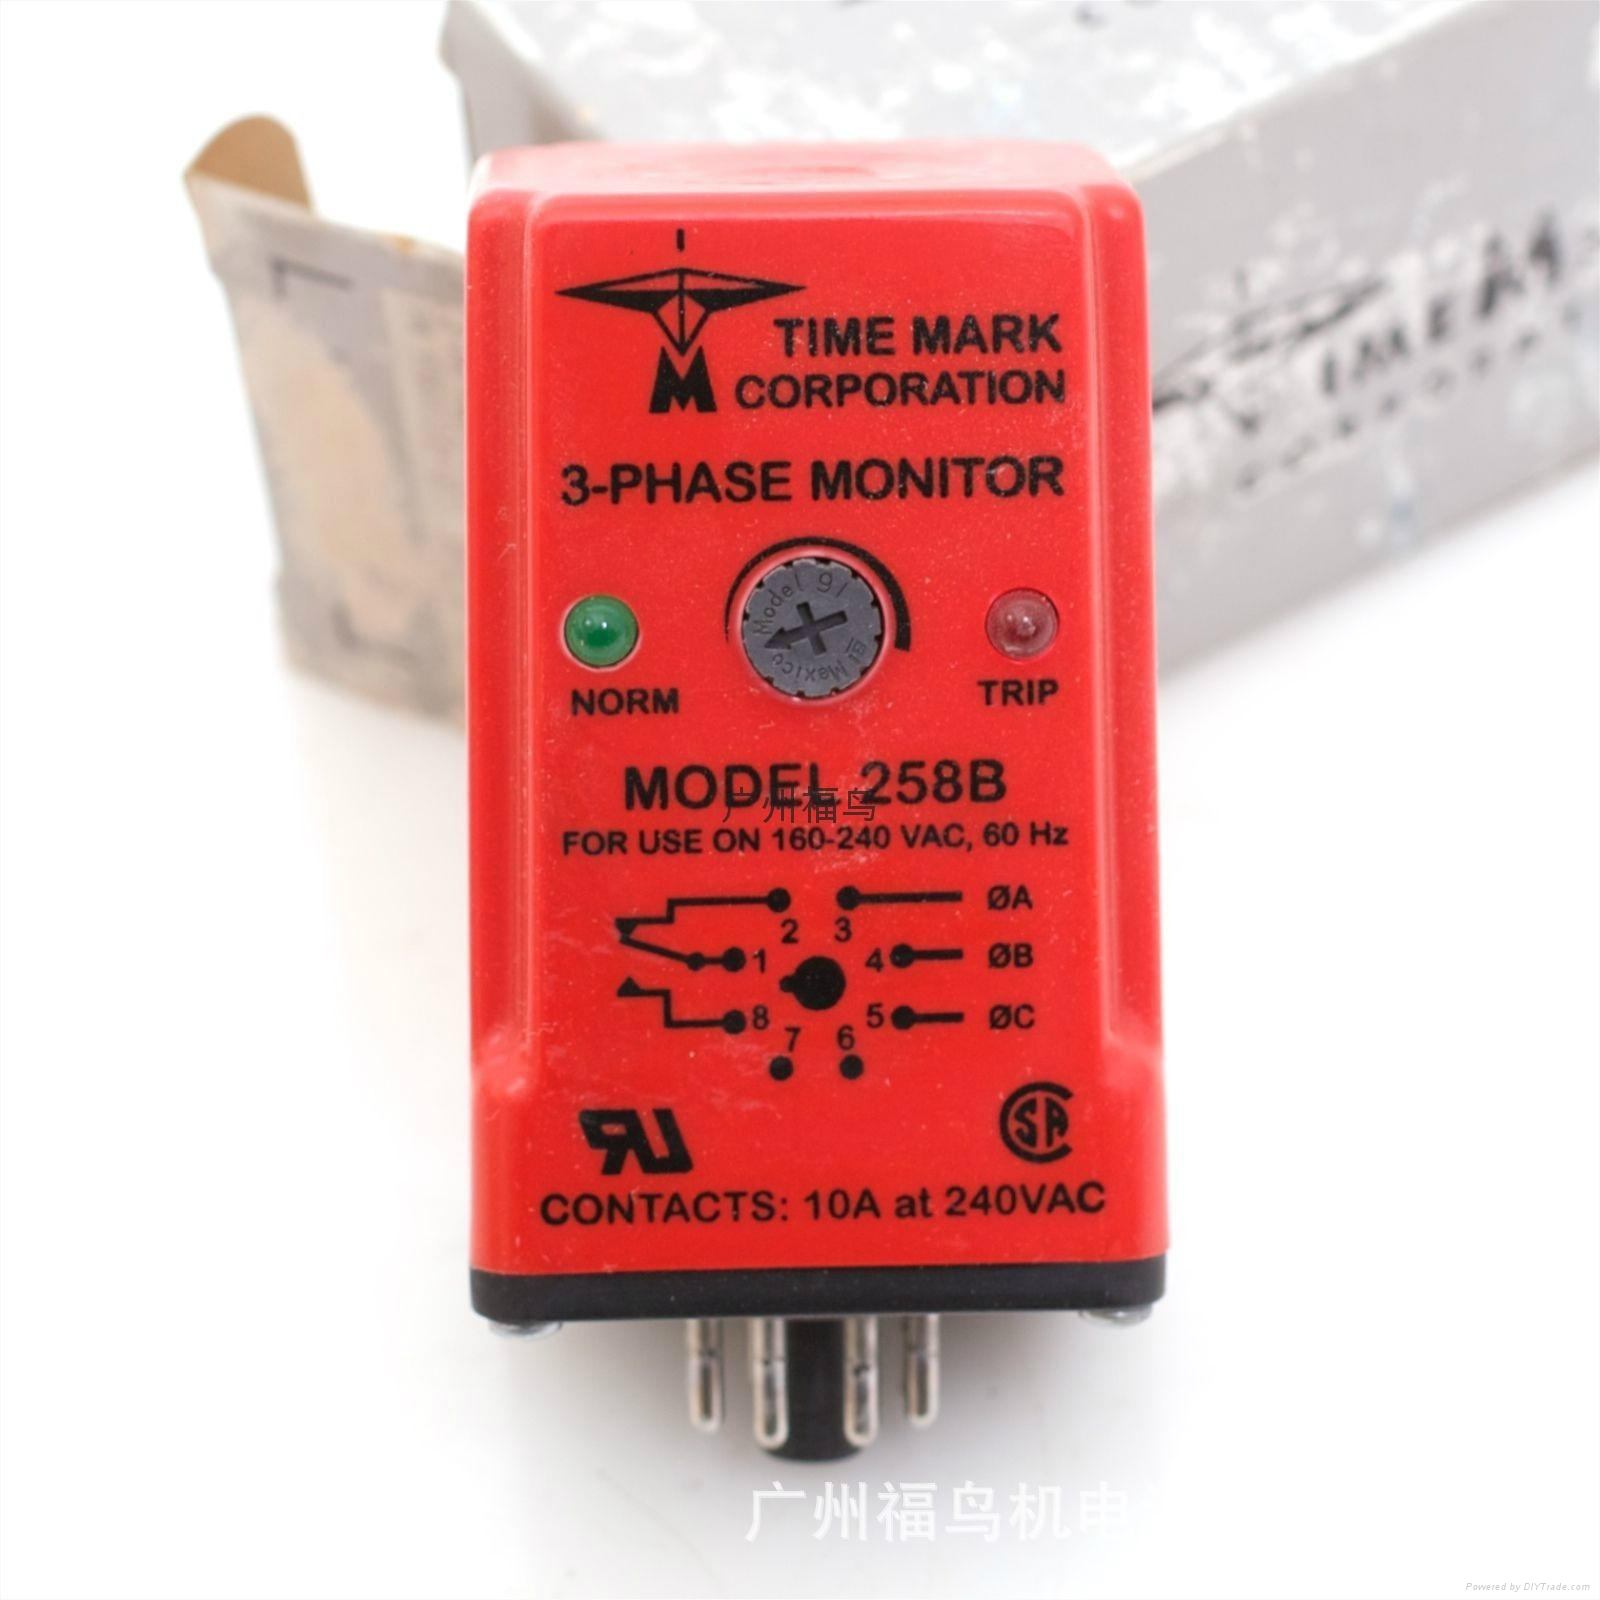 TIME MARK相序檢測器, 三相監控器, 型號: 258B